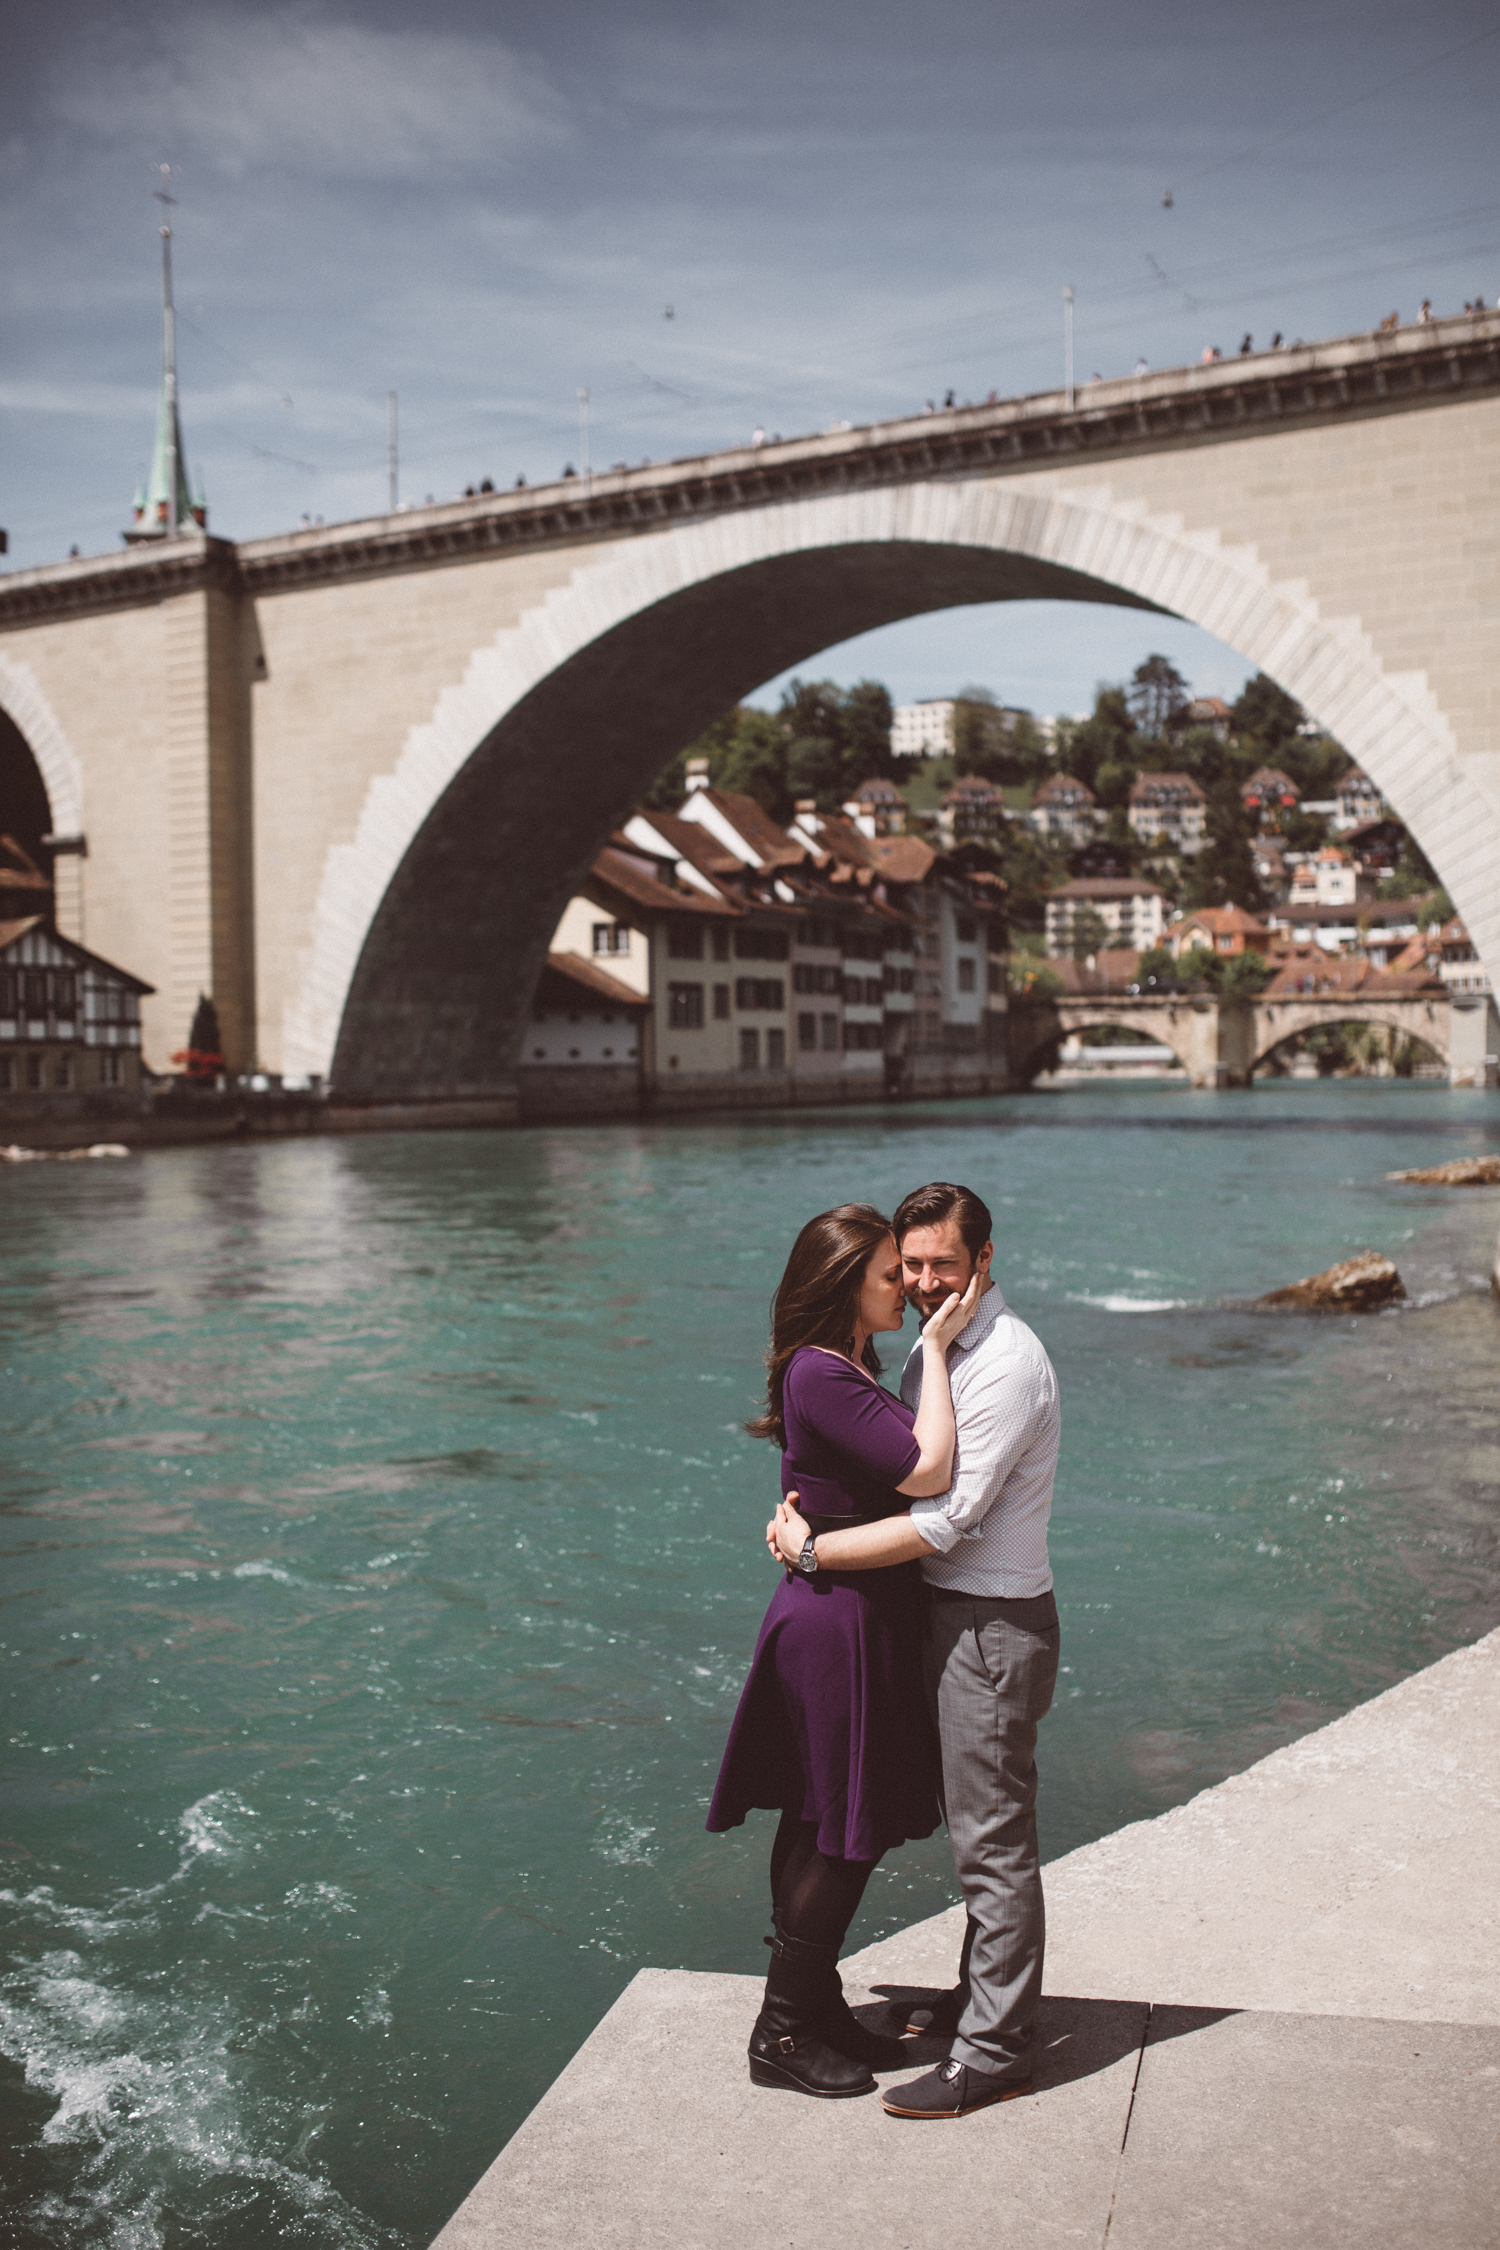 kdp_courtney&sean_wed_web-71.jpg